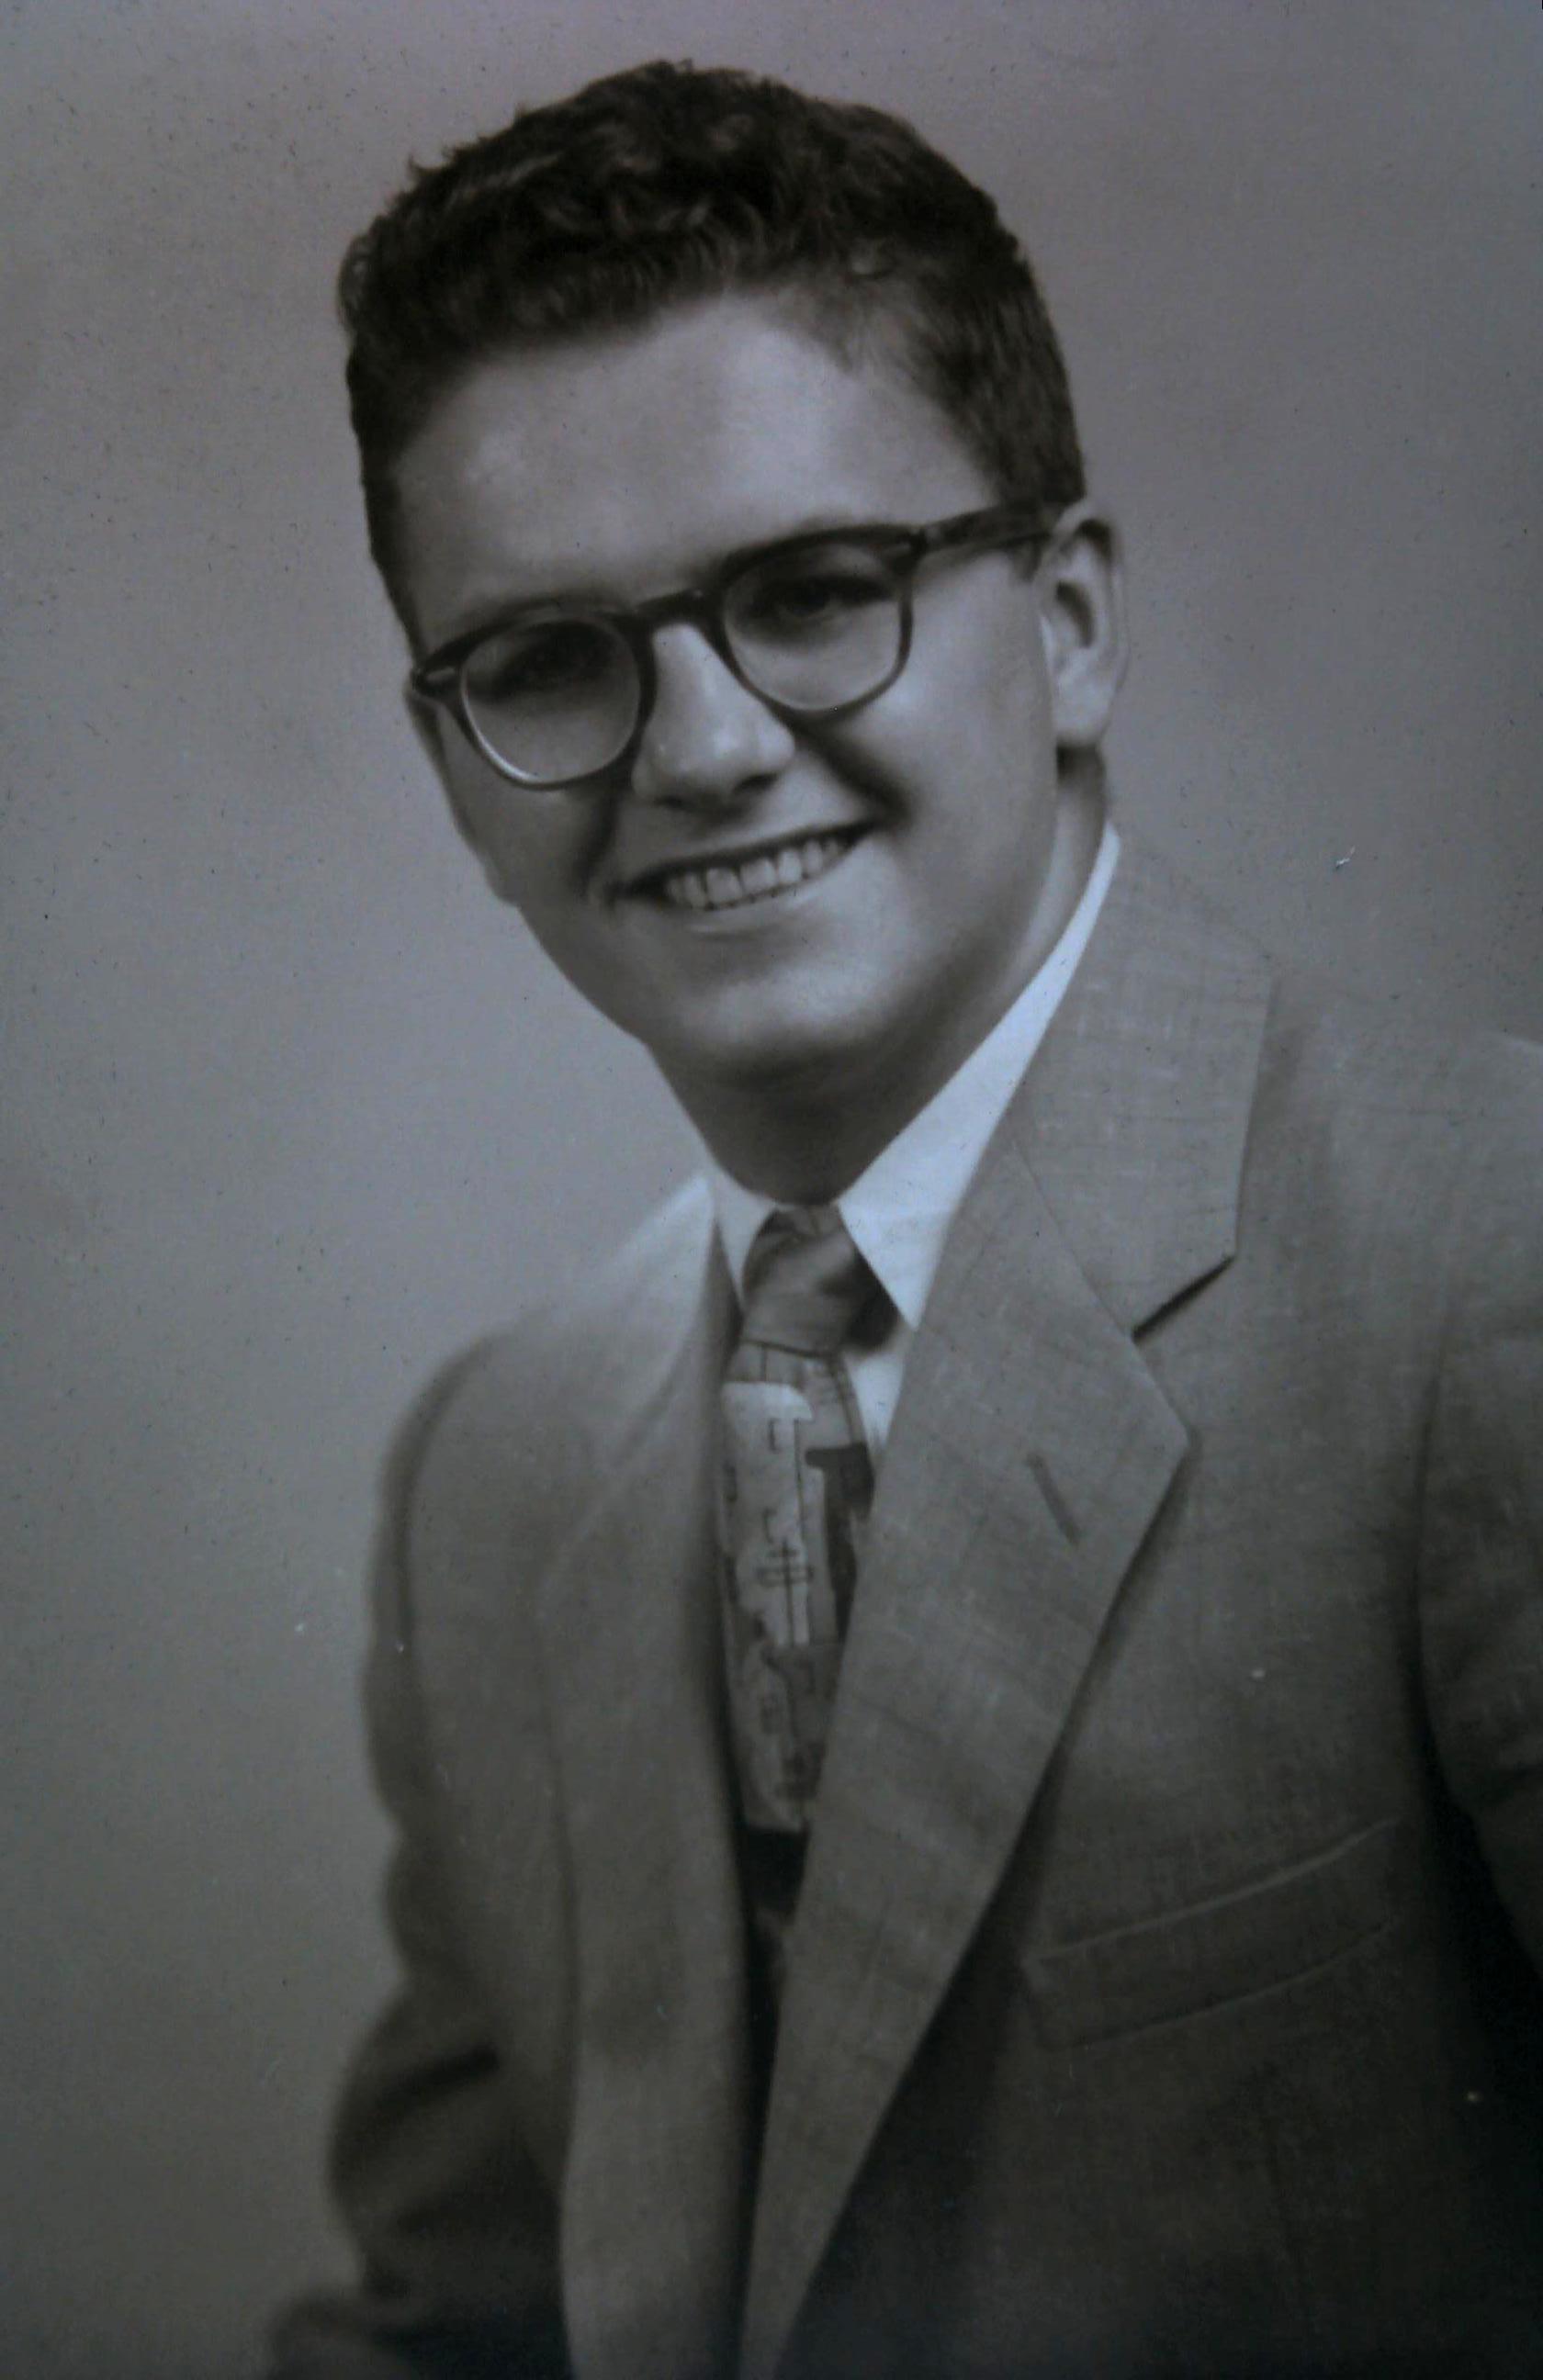 James Robert Dreier: James R. Dreier 1955 HS Senior